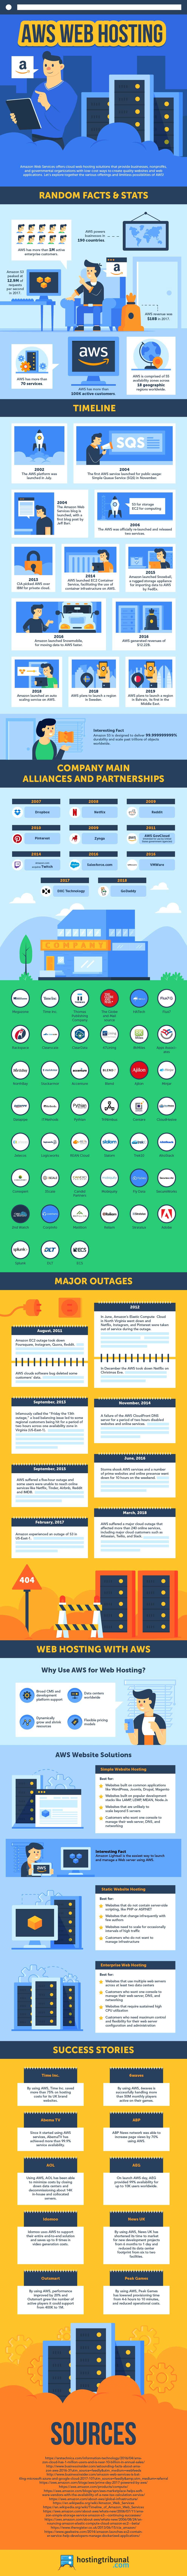 AWS Web Hosting Infographic